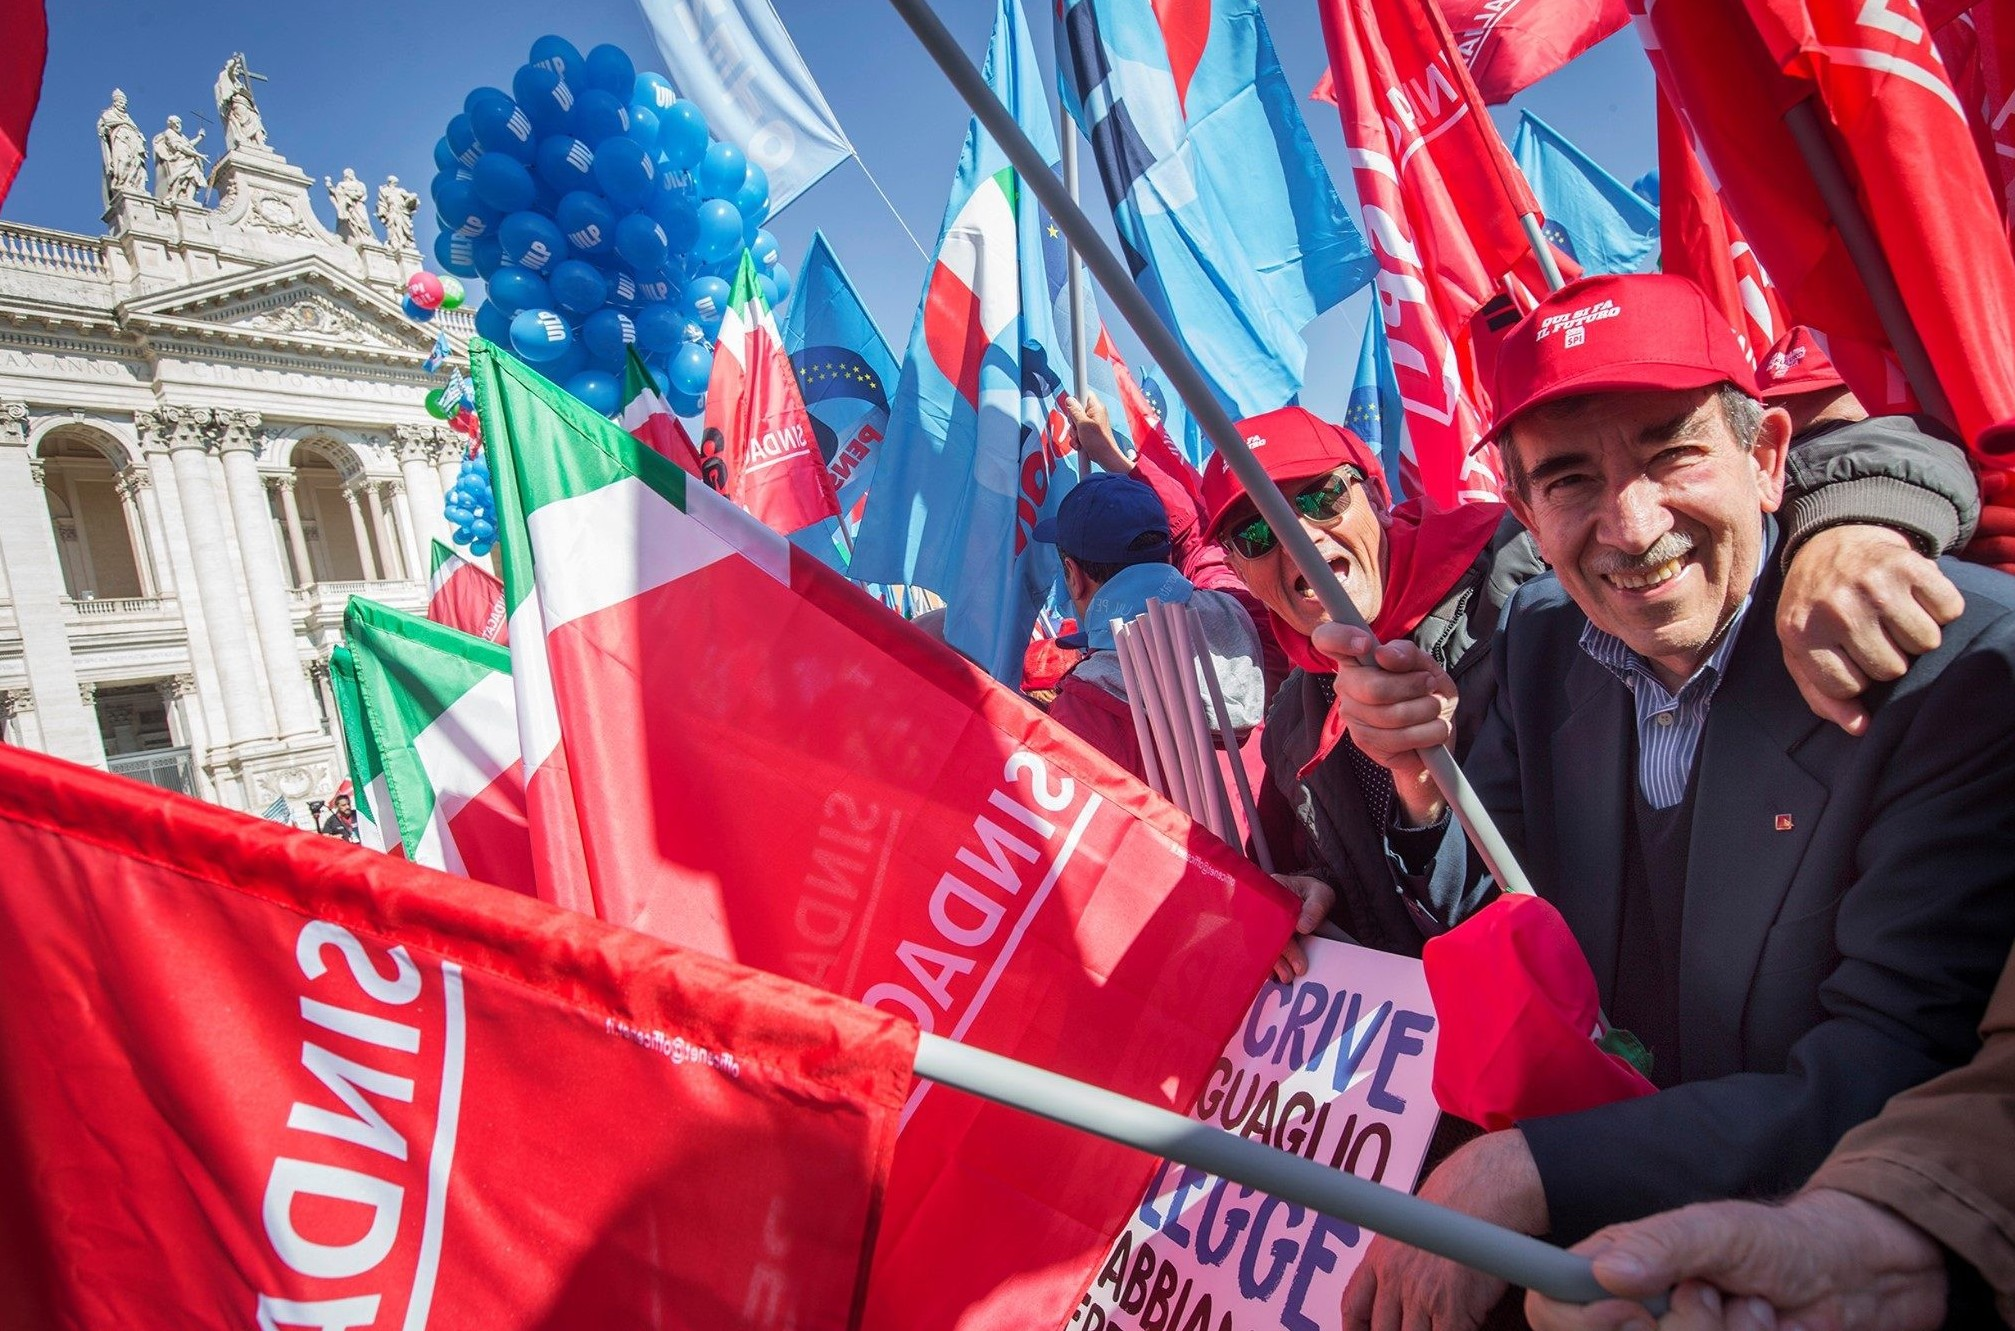 Pensioni, sciopero generale dei sindacat